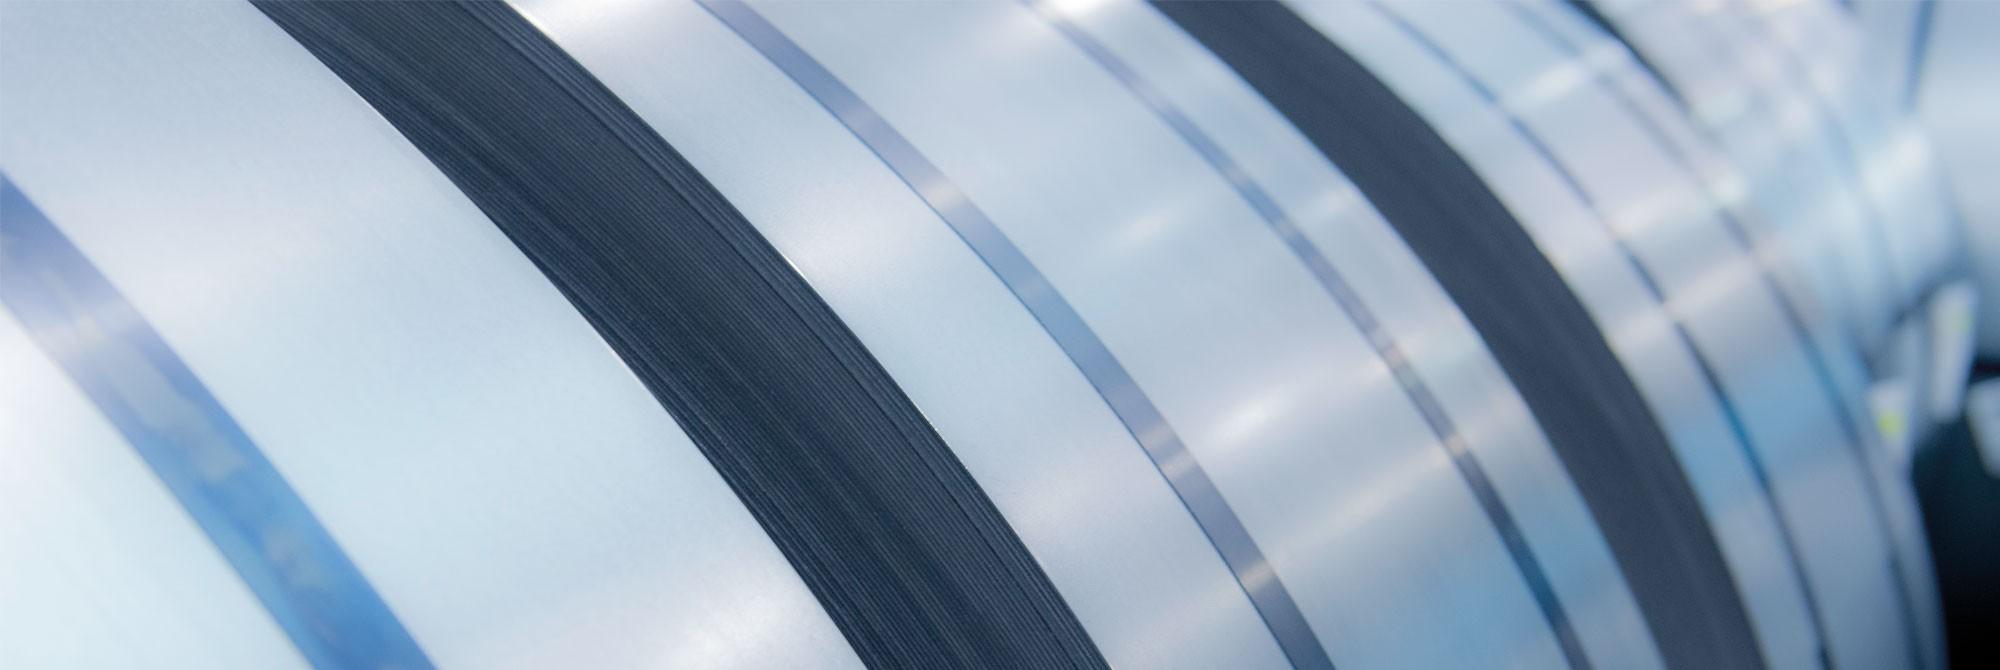 Rerolled precision steel strip